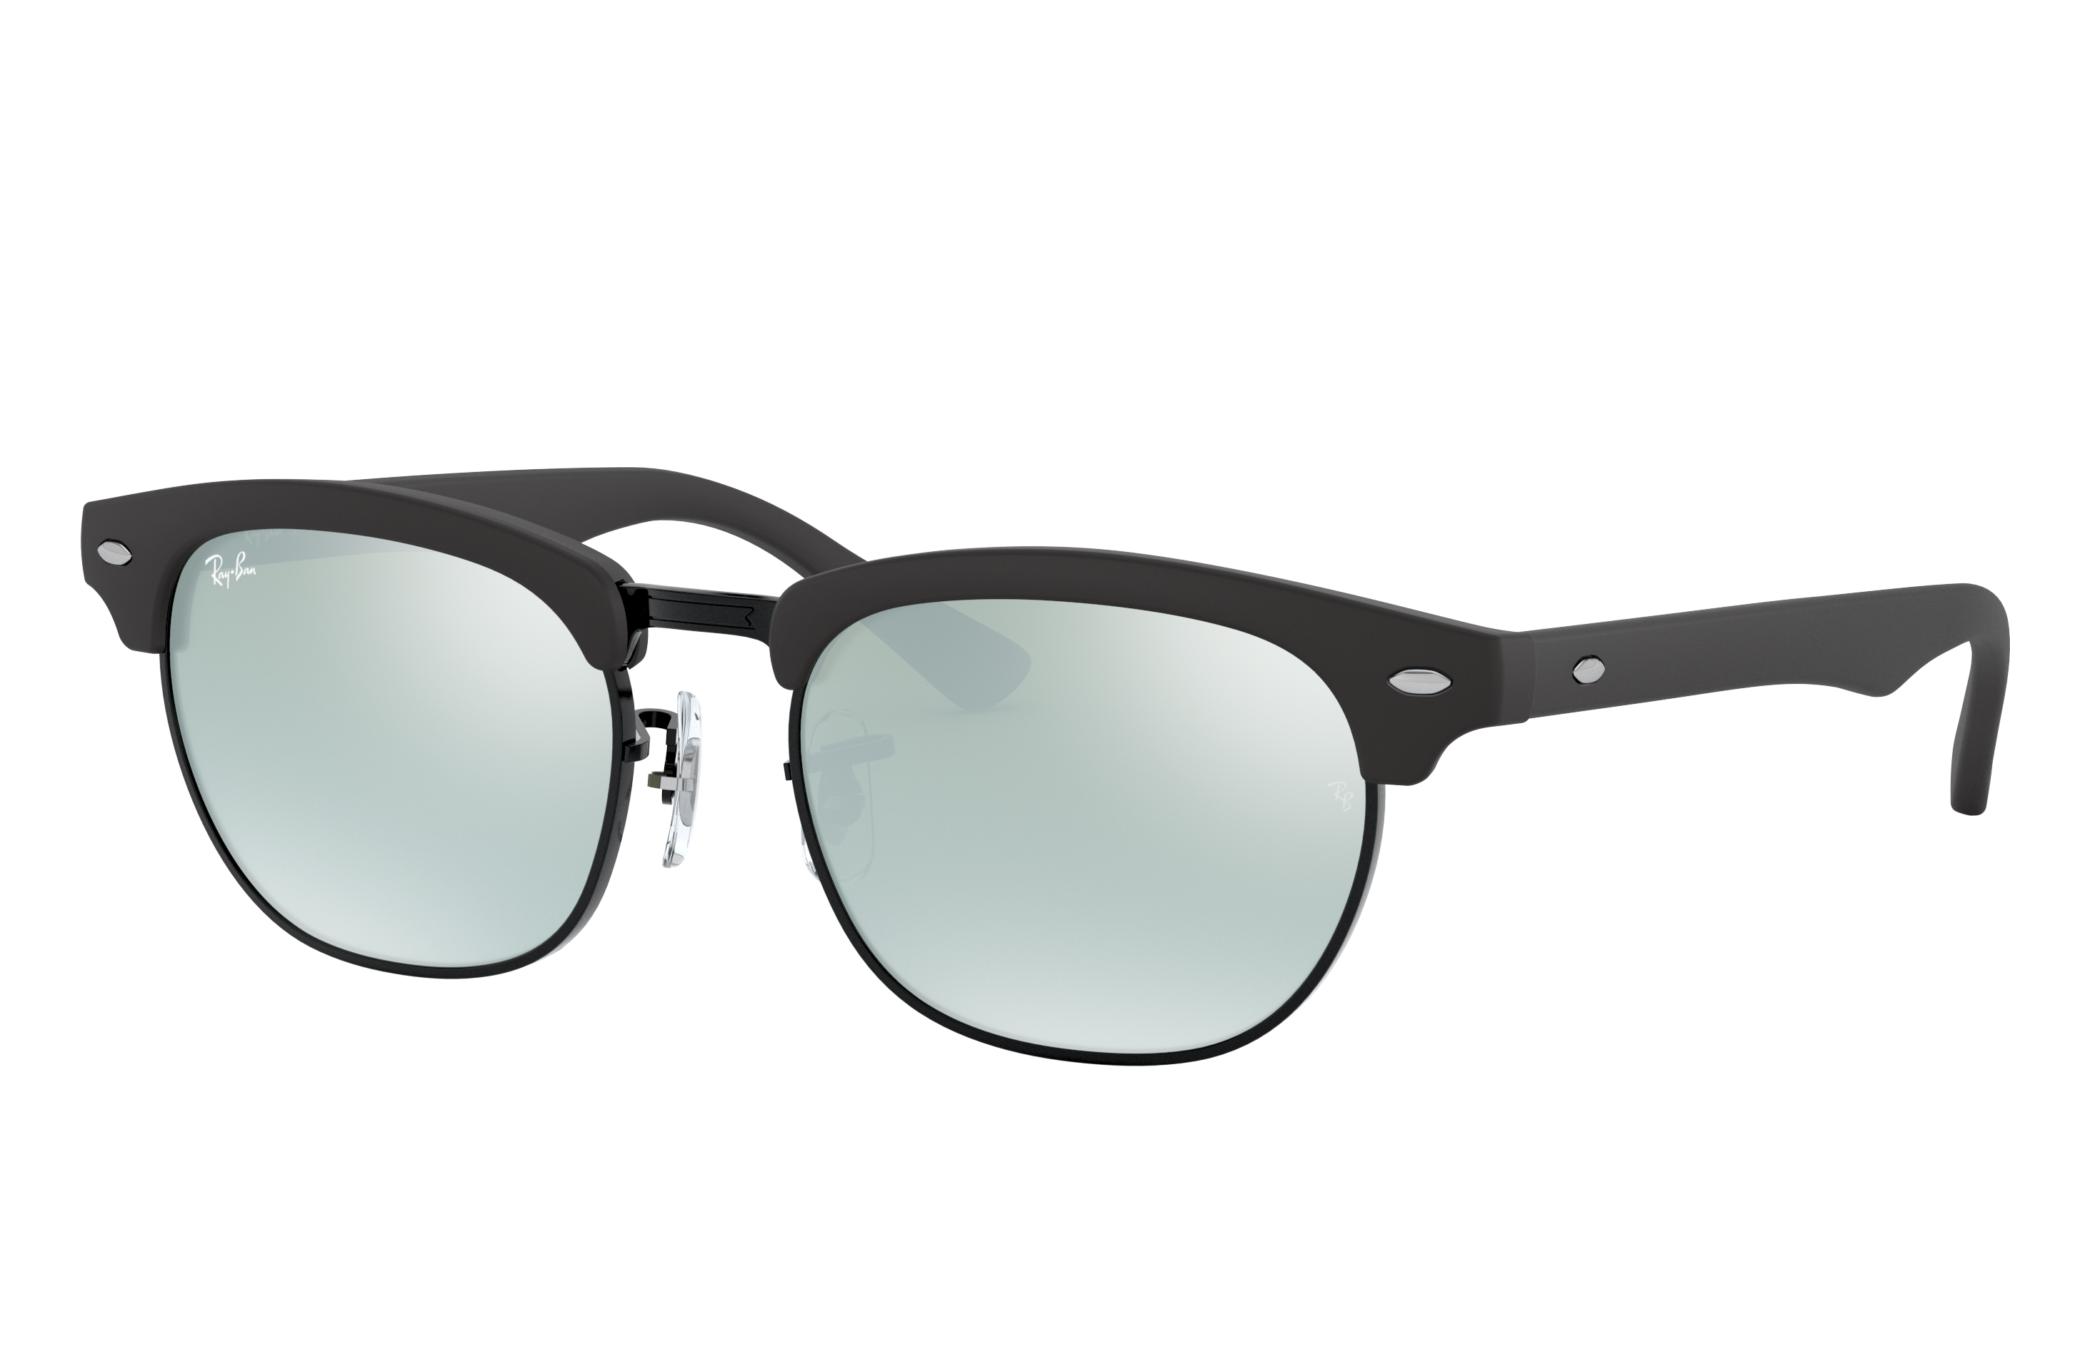 Ray-Ban Clubmaster Junior Black, Gray Lenses - RJ9050S